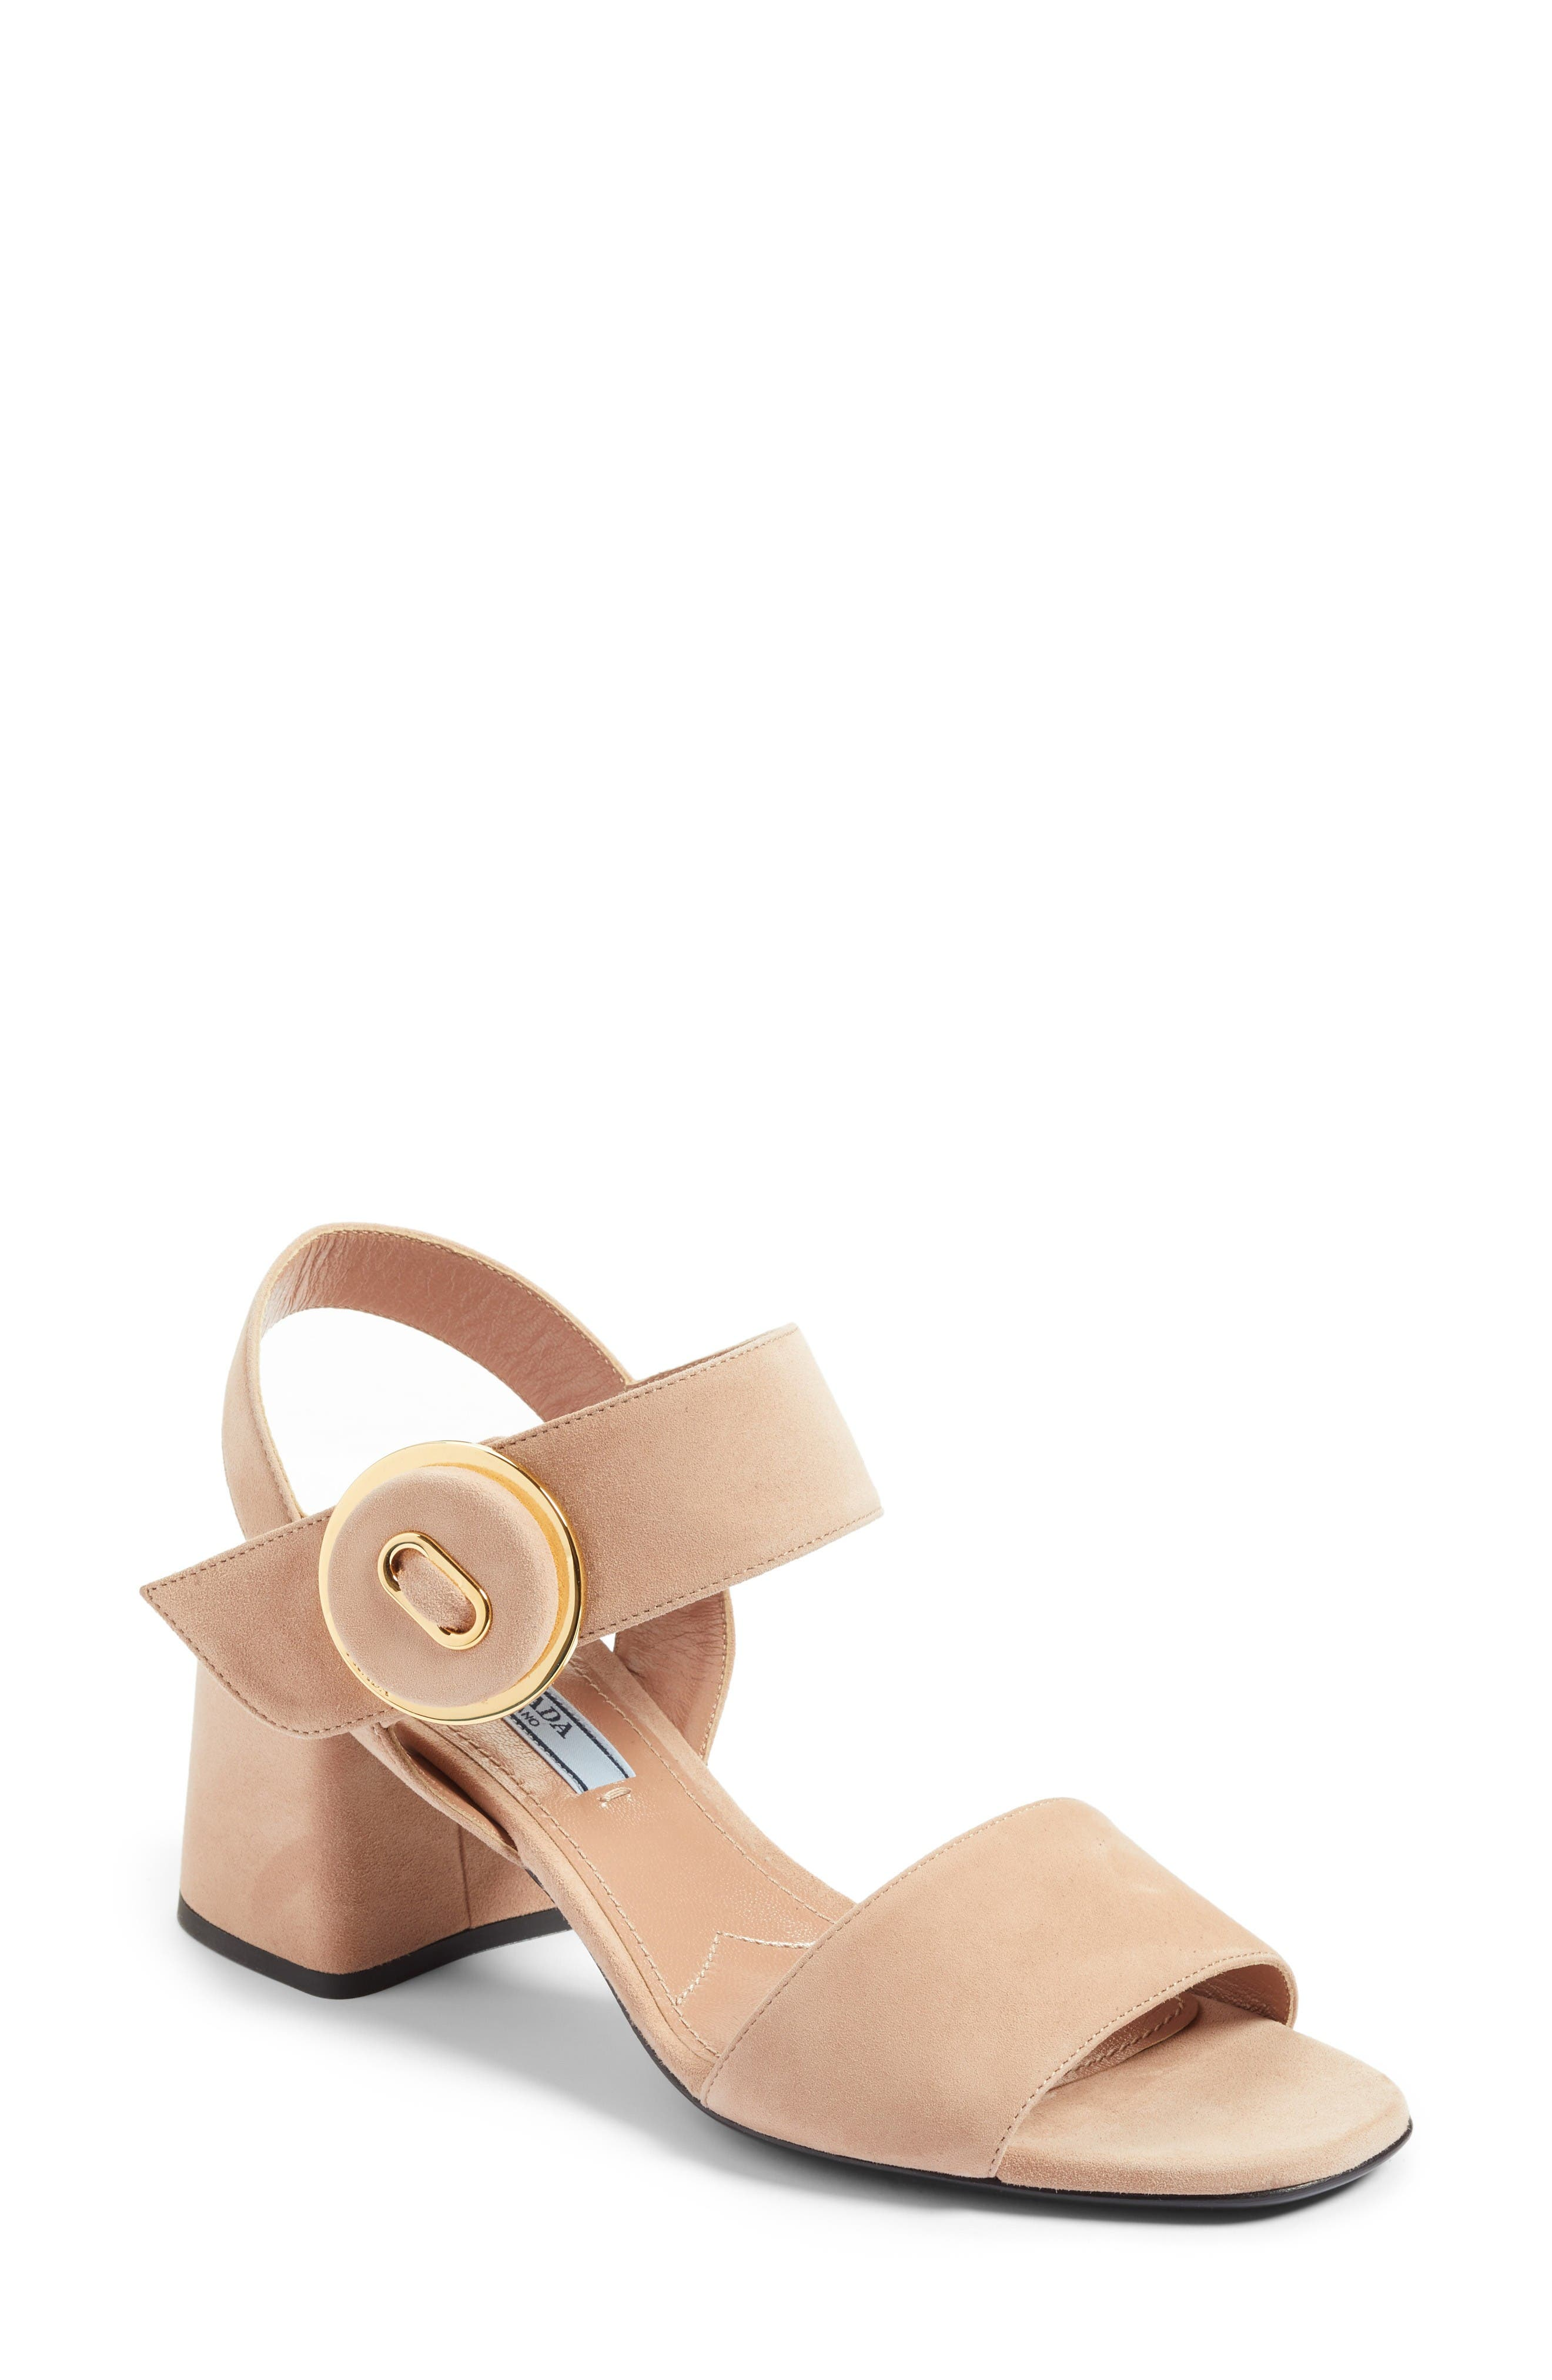 PRADA Button Sandal